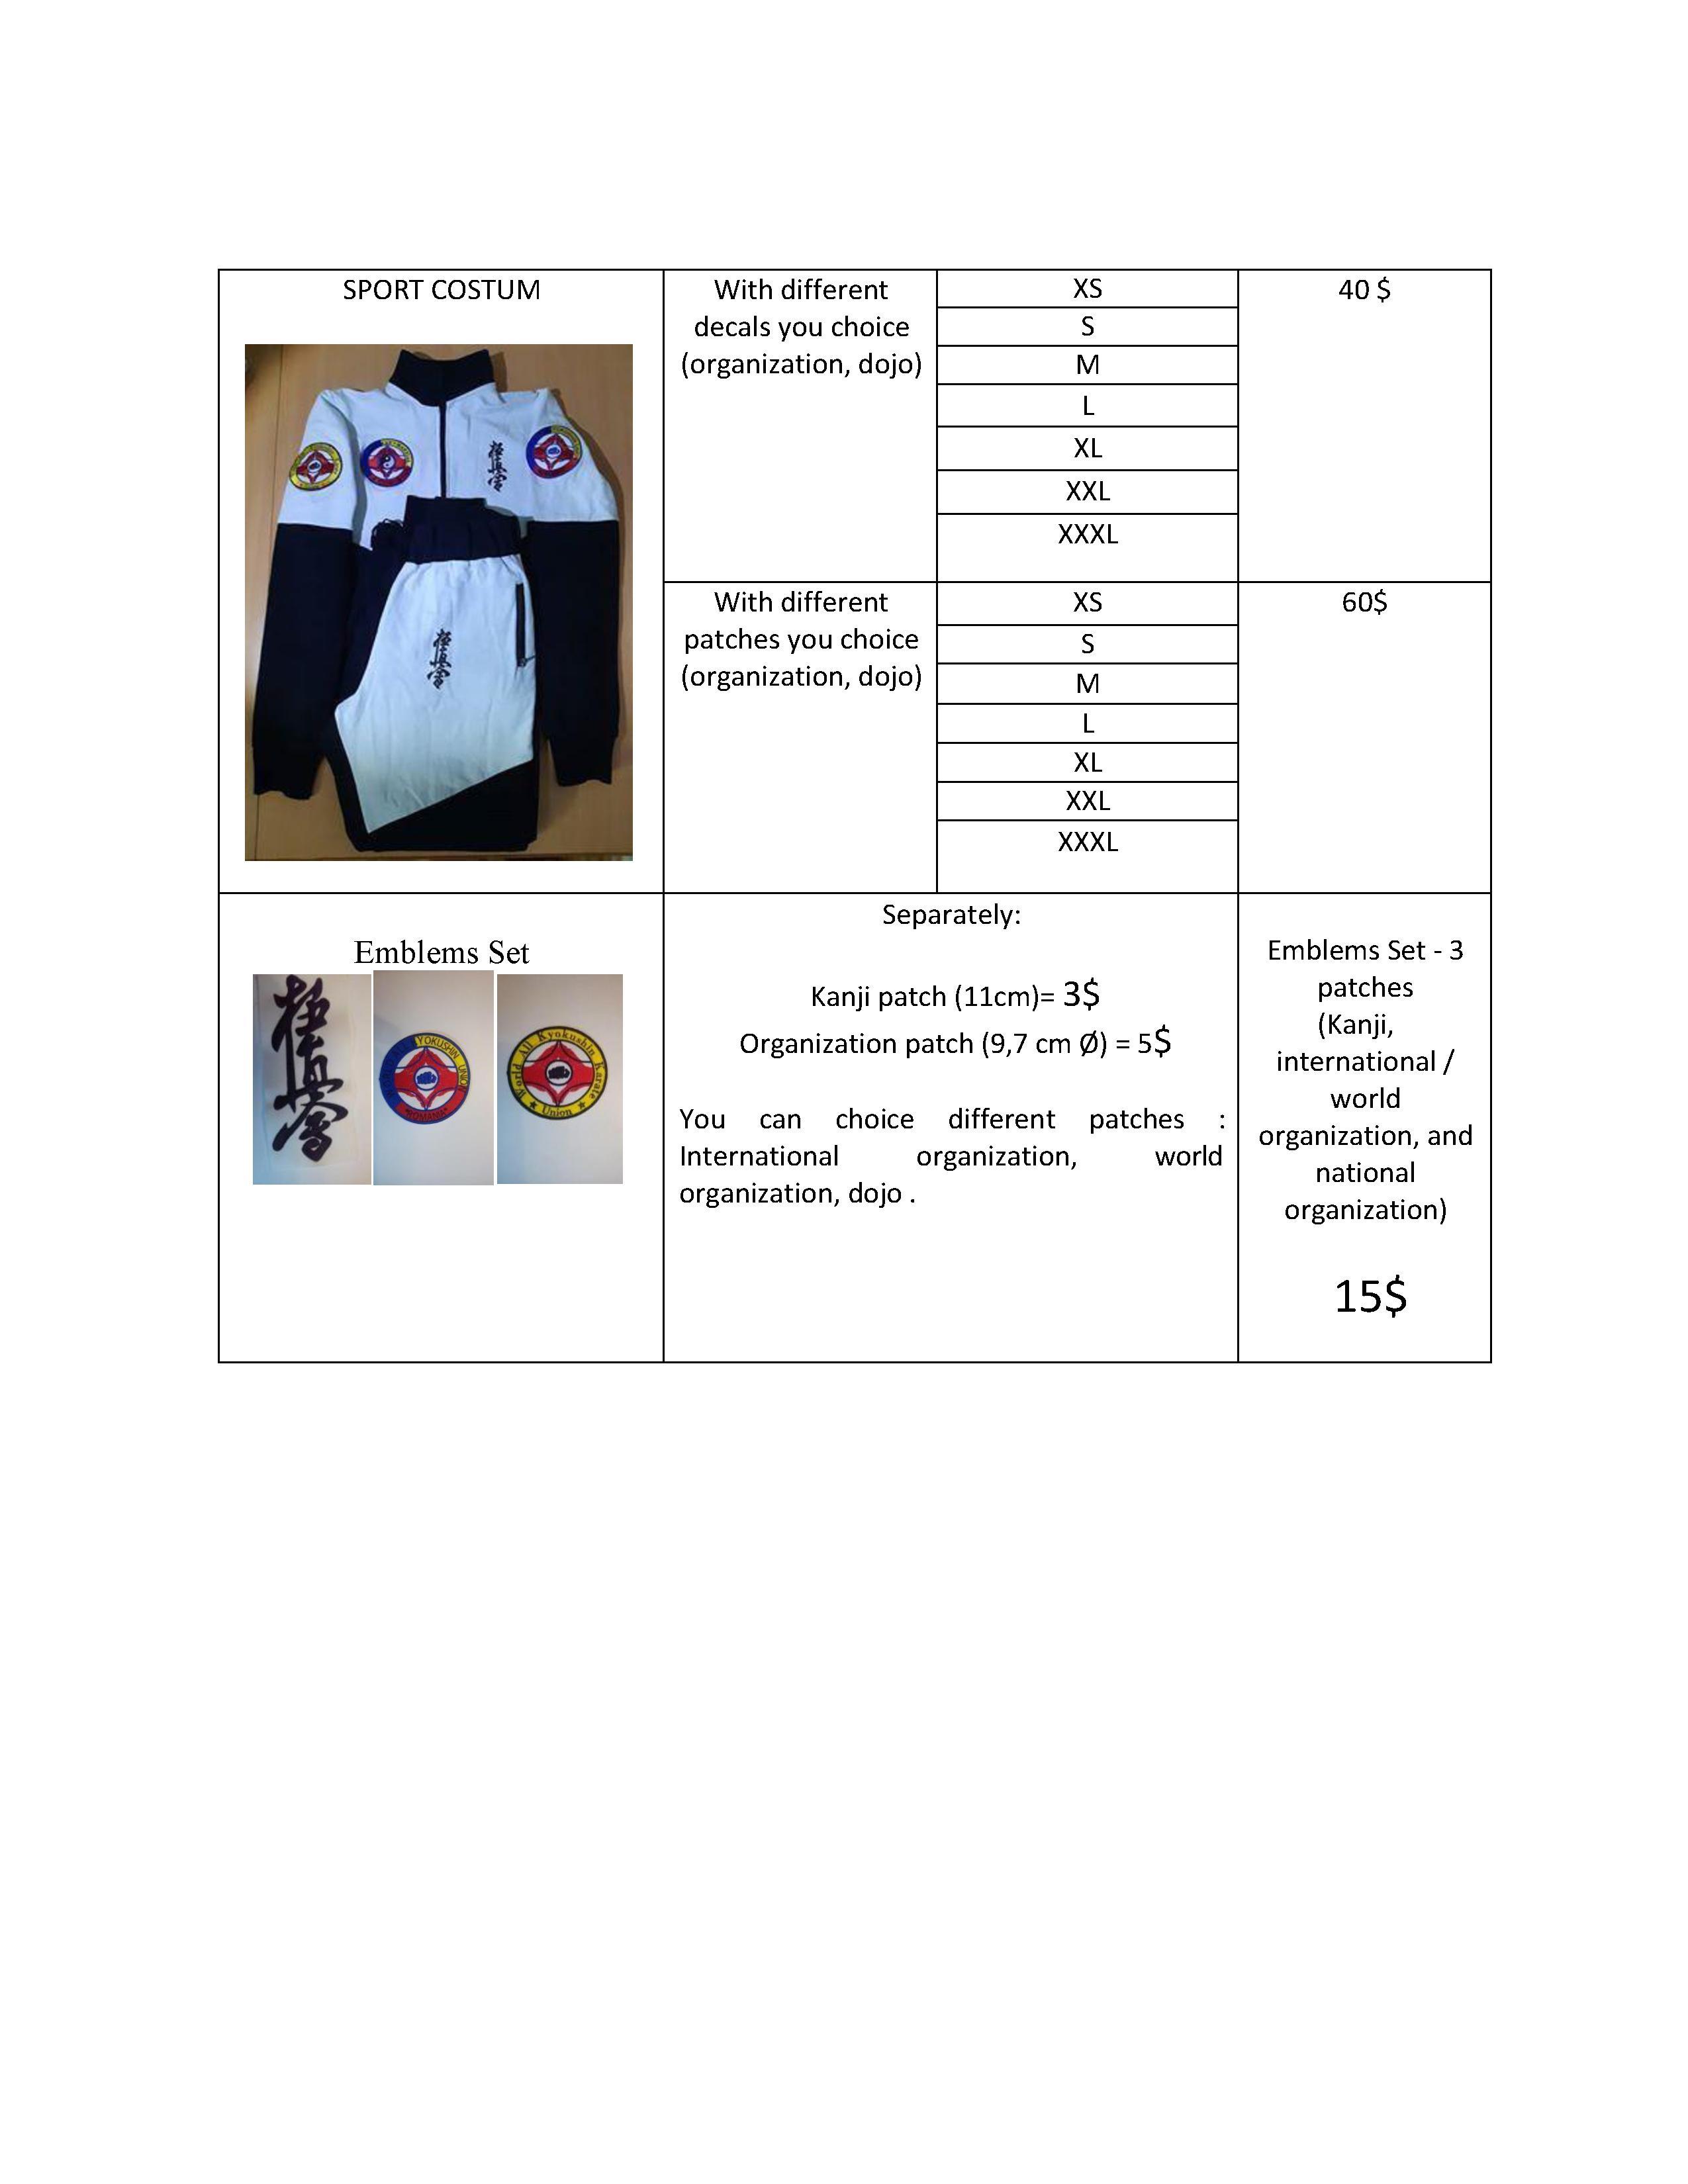 CATALOGUE-SPORTS-EQUIPMENT-DAO KAN Creations SRL-17